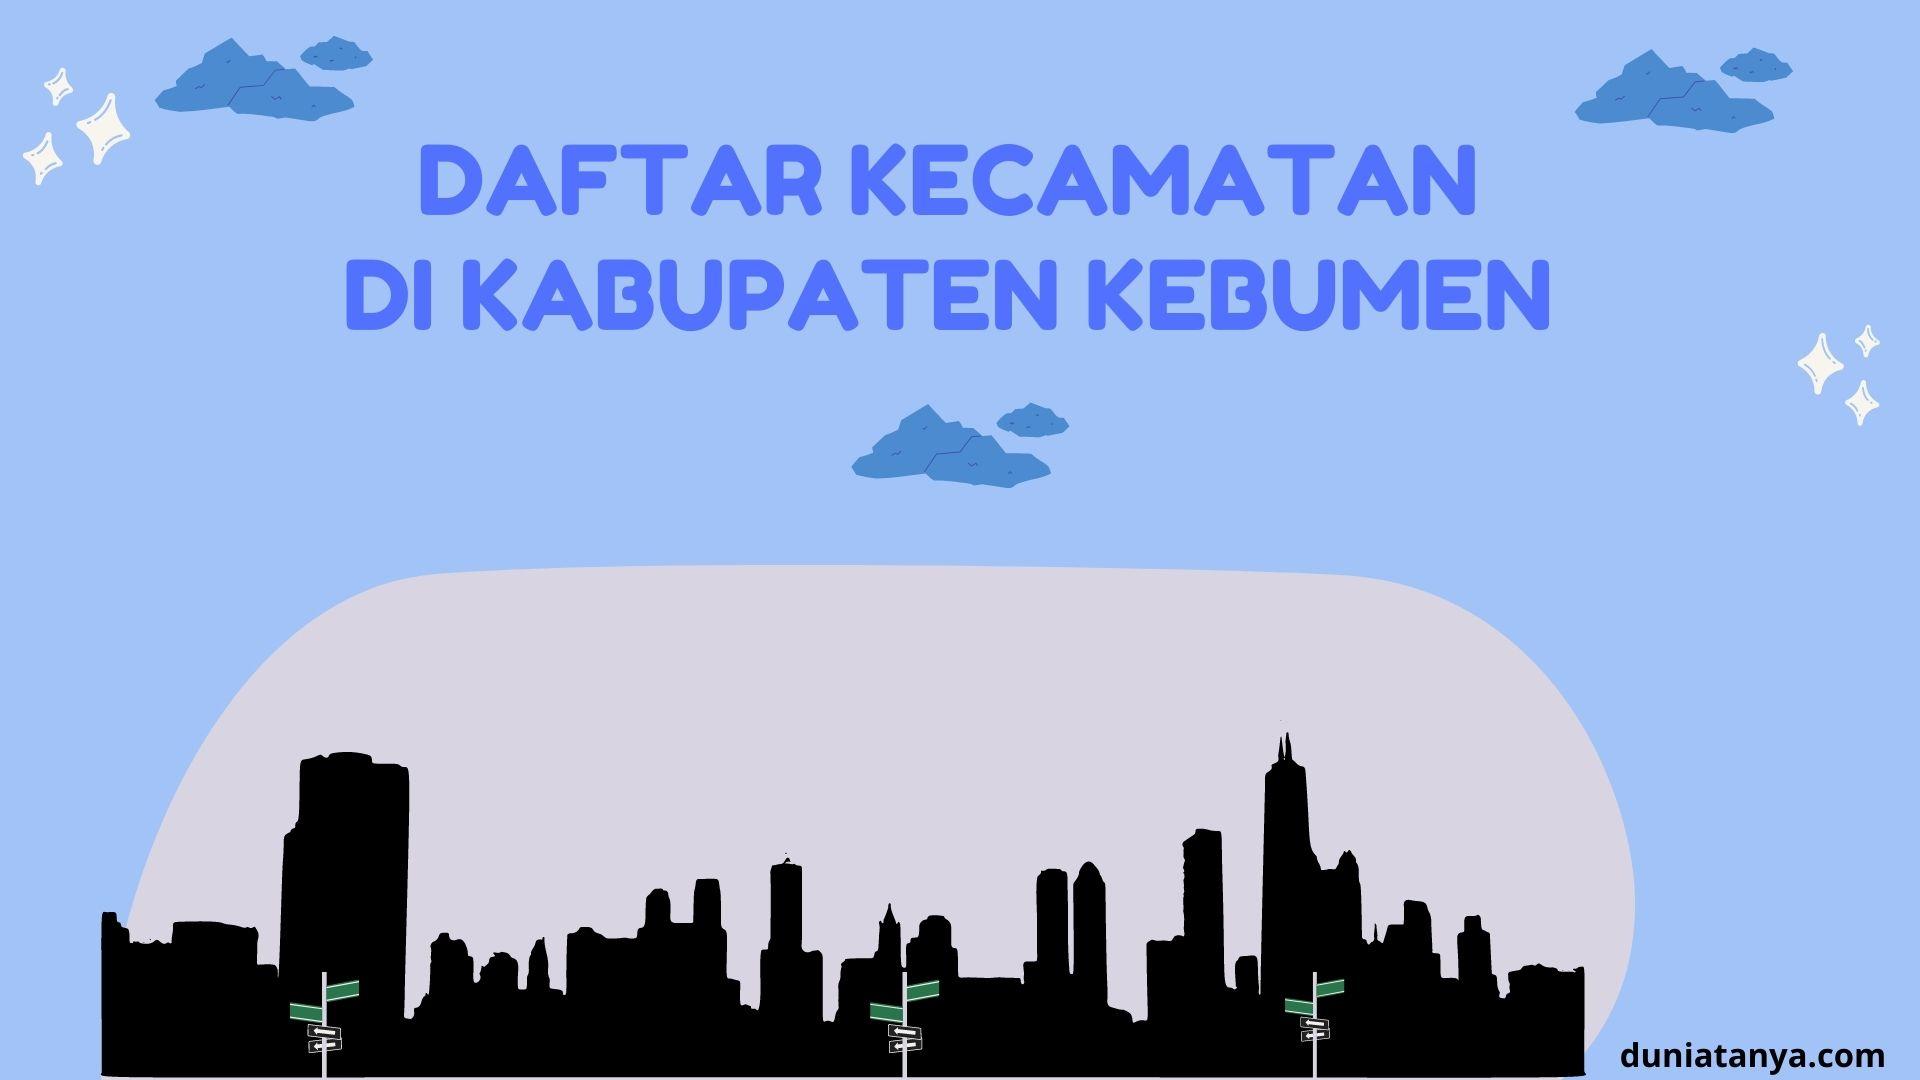 You are currently viewing Daftar Kecamatan Di Kabupaten Kebumen